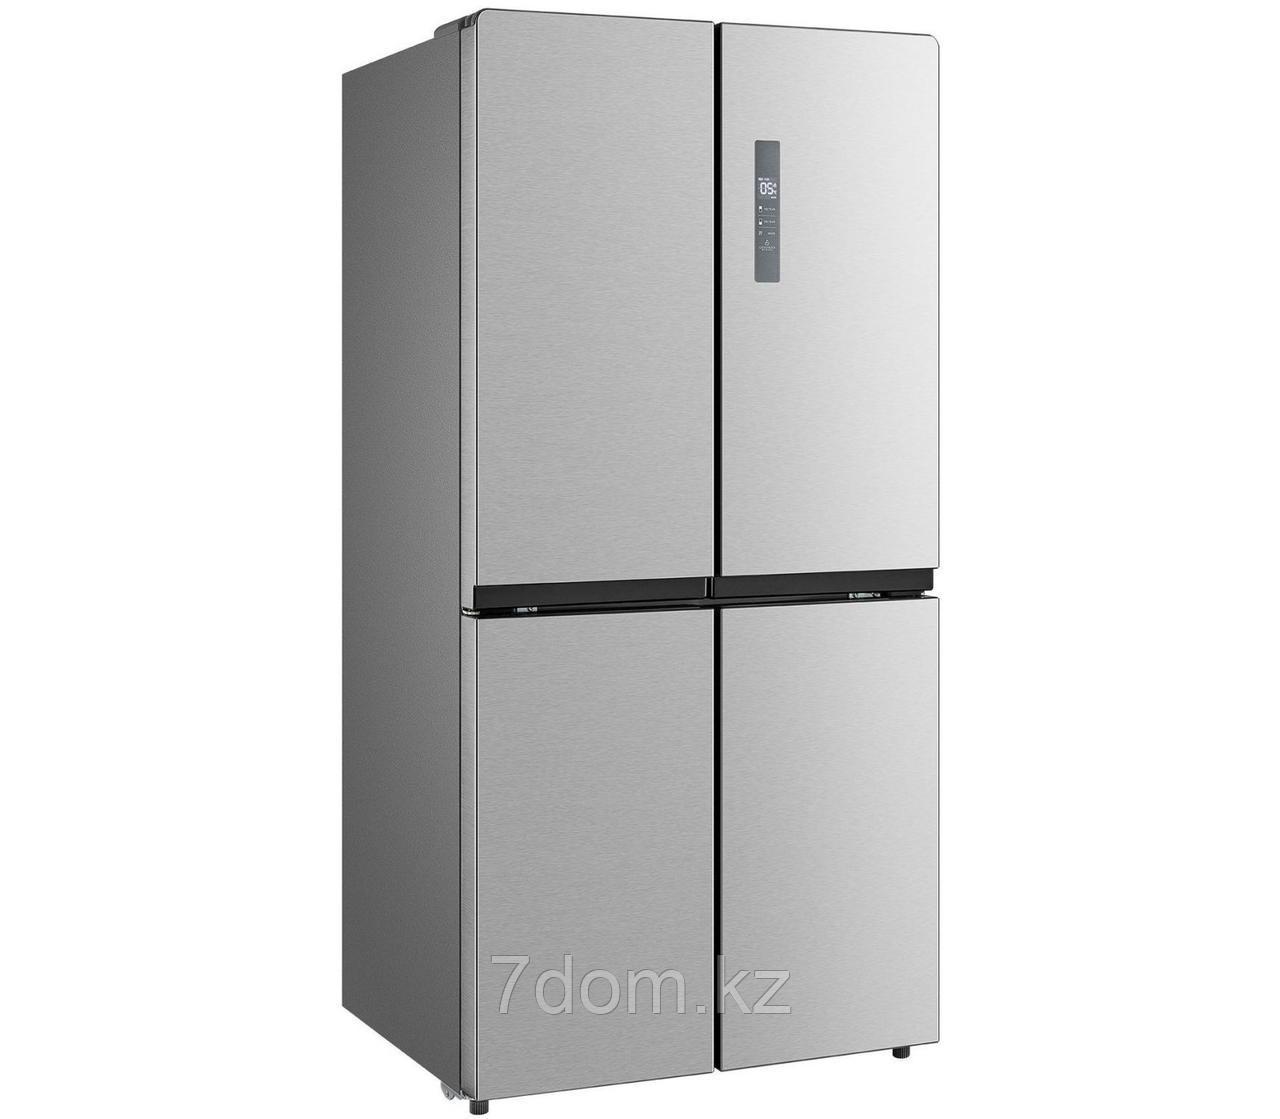 Холодильник Midea 4Door HQ-627WEN(BST)